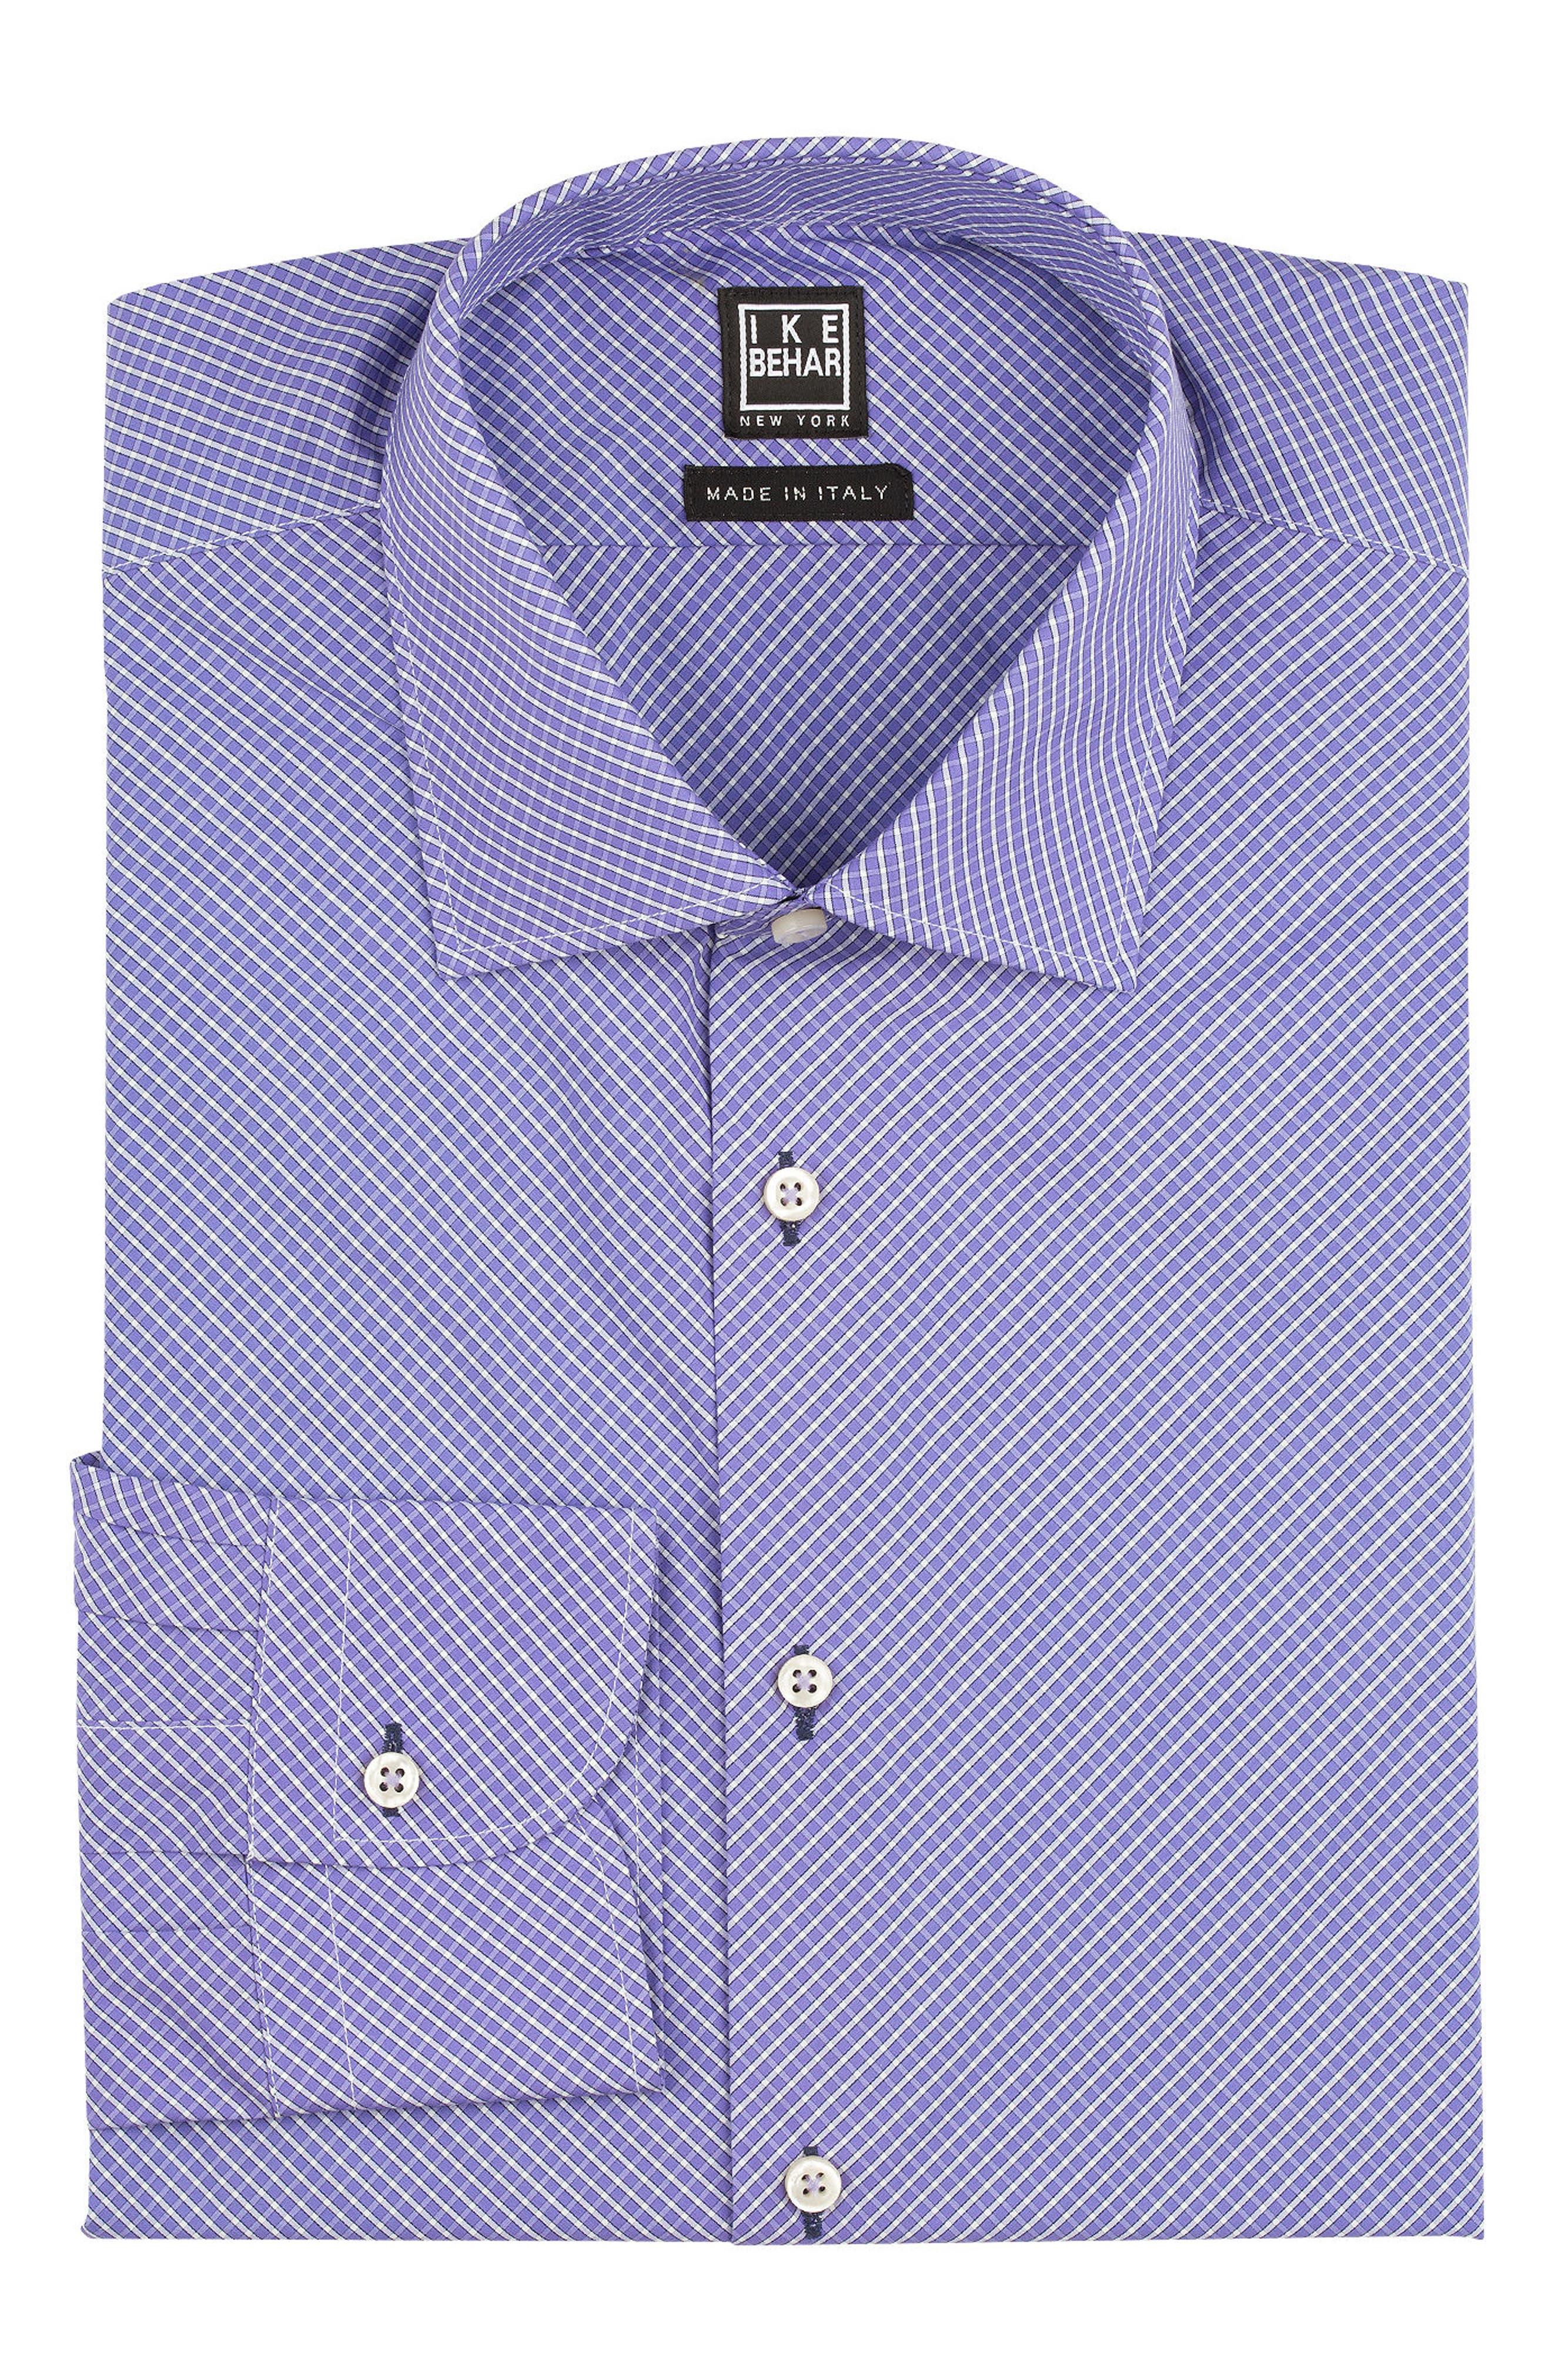 Regular Fit Check Dress Shirt,                             Alternate thumbnail 5, color,                             PURPLE